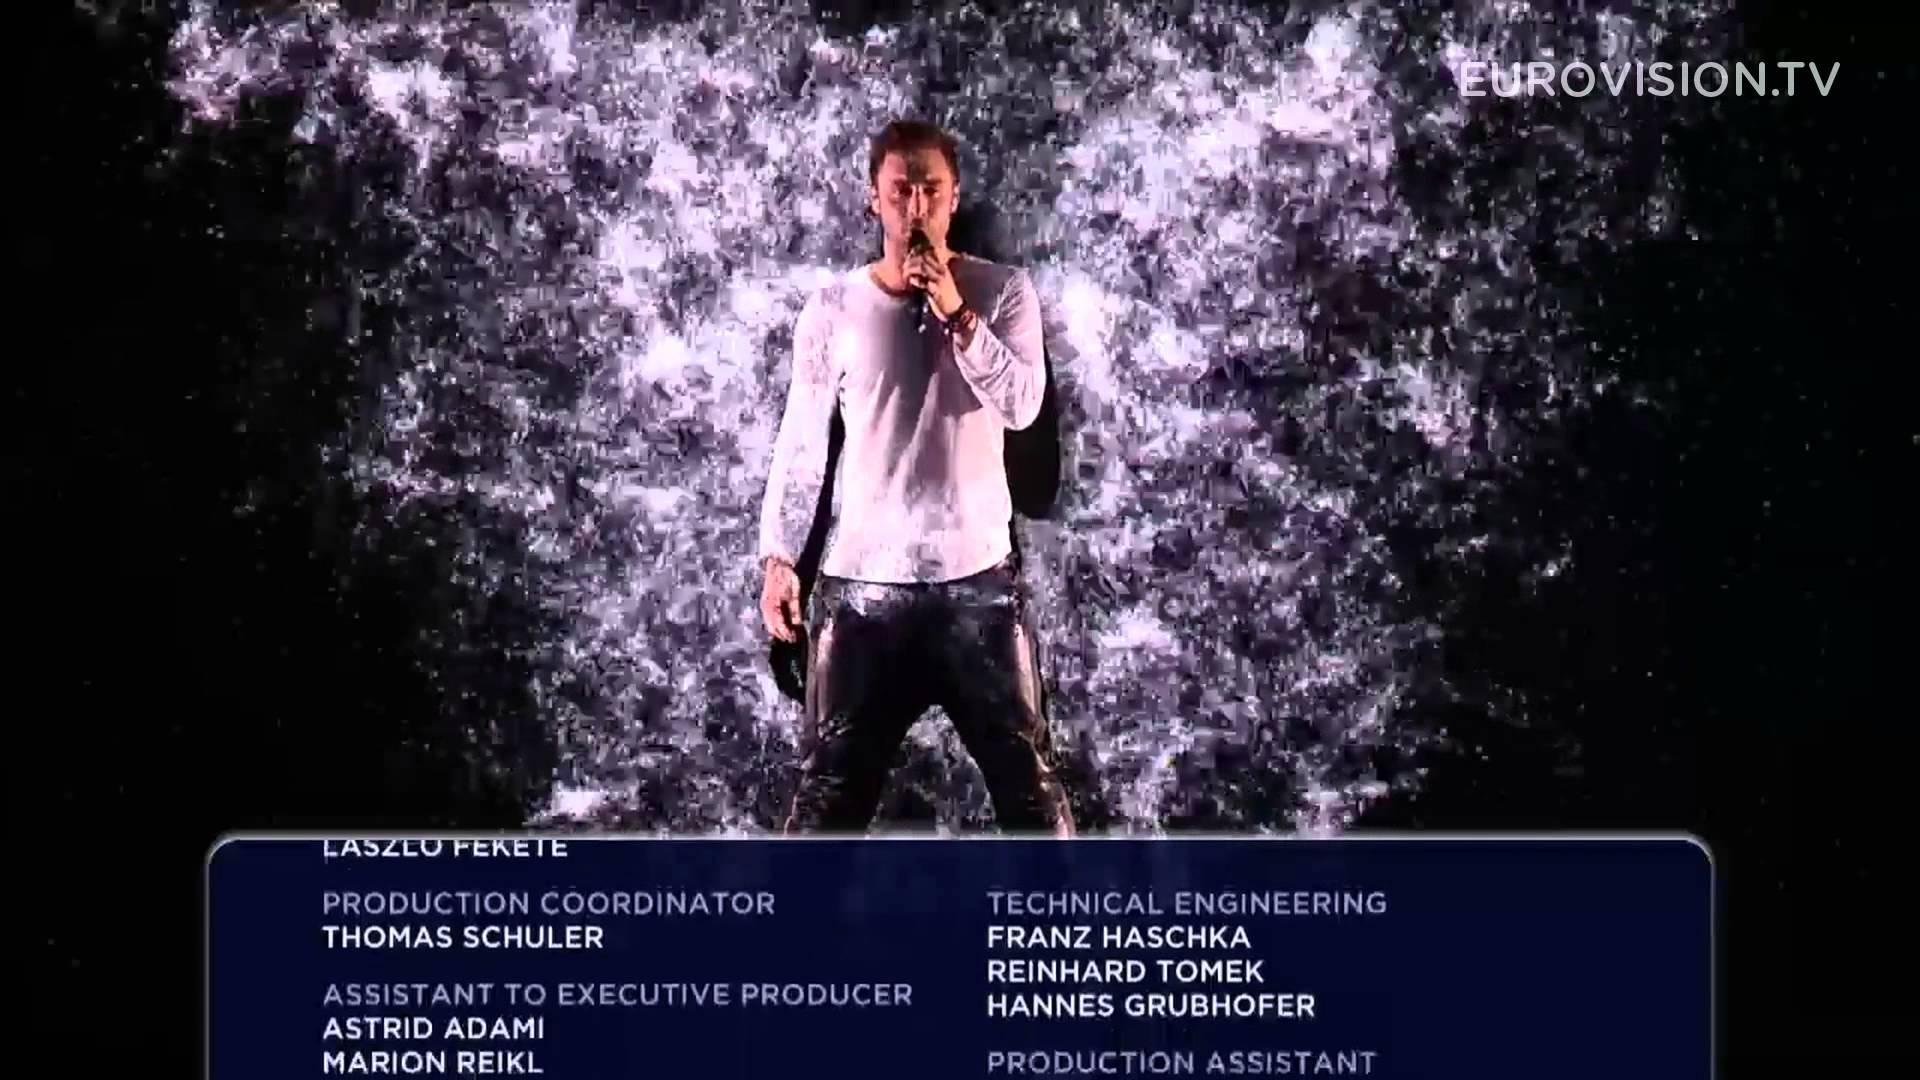 Eurovision 2015: Τελικός ήταν και πάει! Μάθετε όλο το παρασκήνιο και κουτσομπολιά